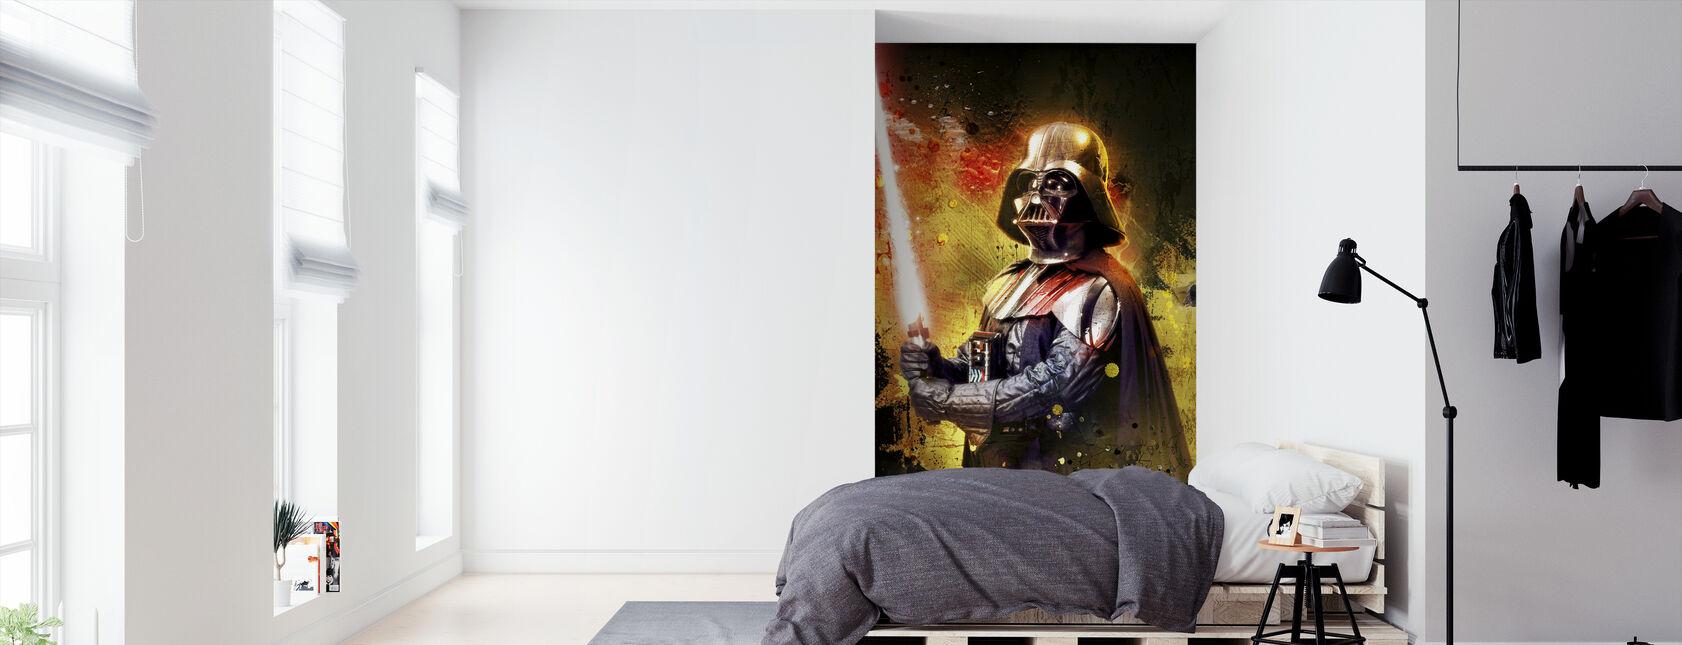 Star Wars - Darth Vader kolor miecz świetlny - Tapeta - Sypialnia